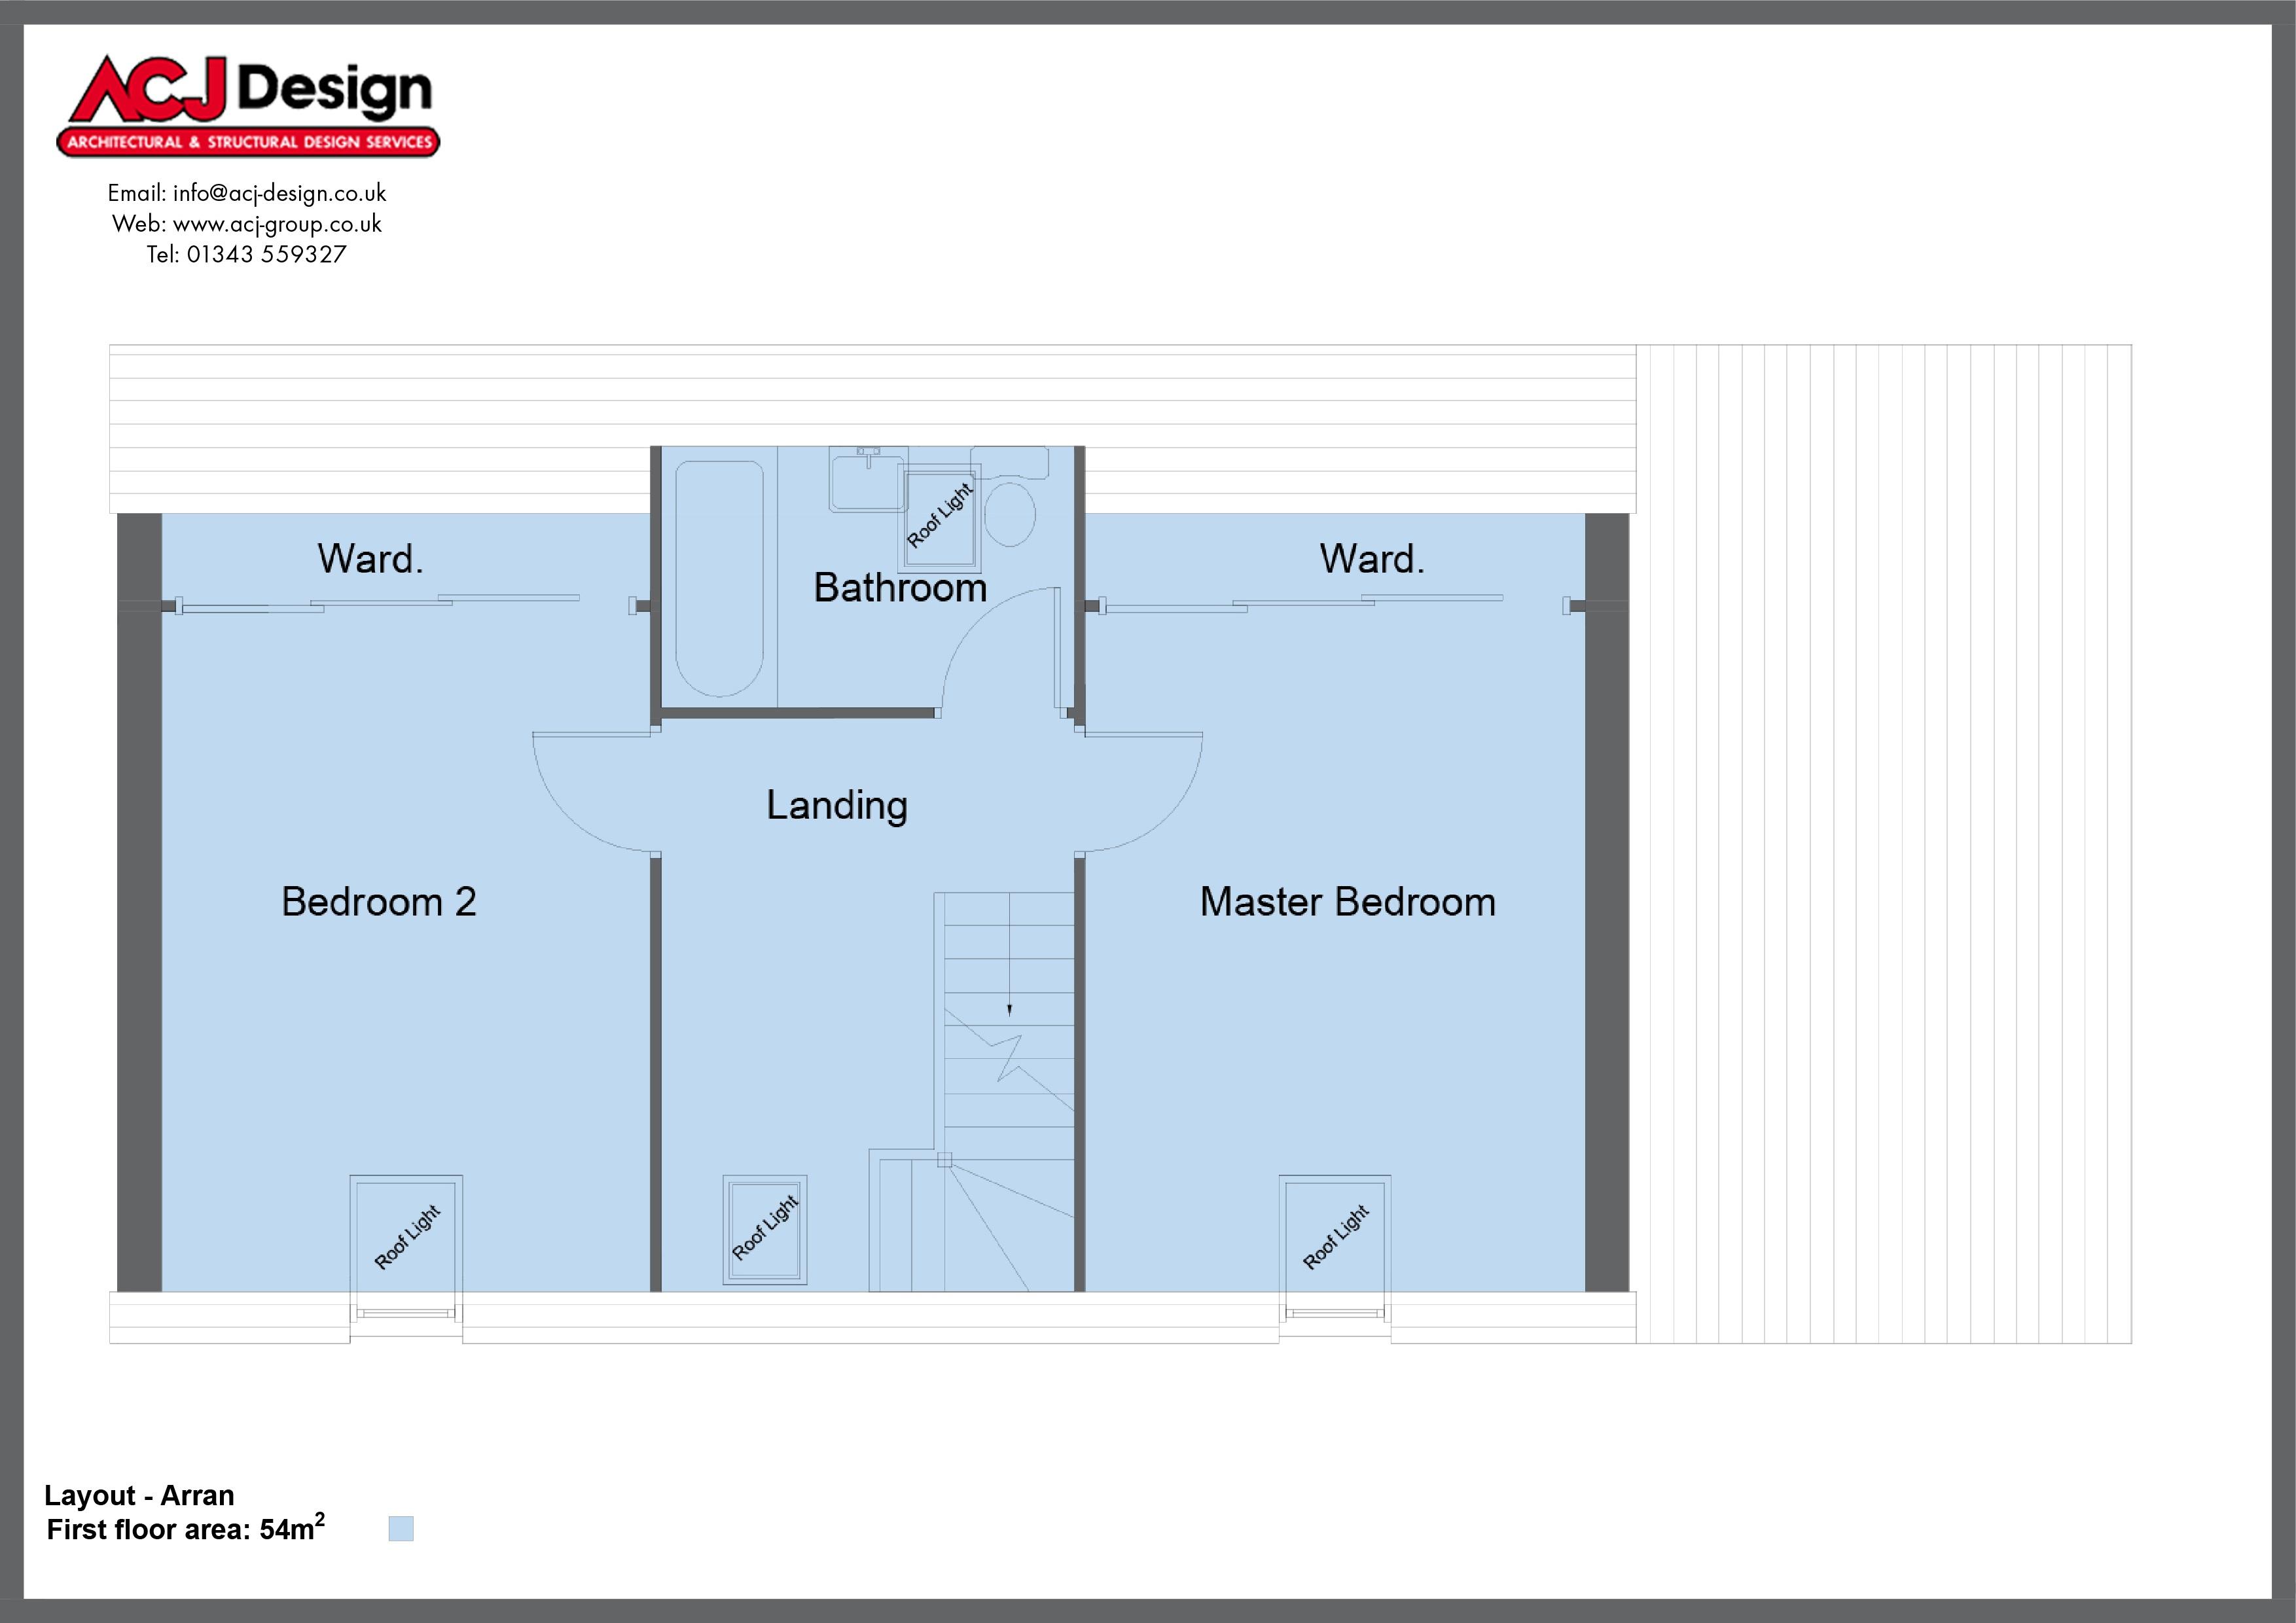 Good Arran House Type First Floor Plan With ACJ Design Logo   3 Bedroom Island  Range